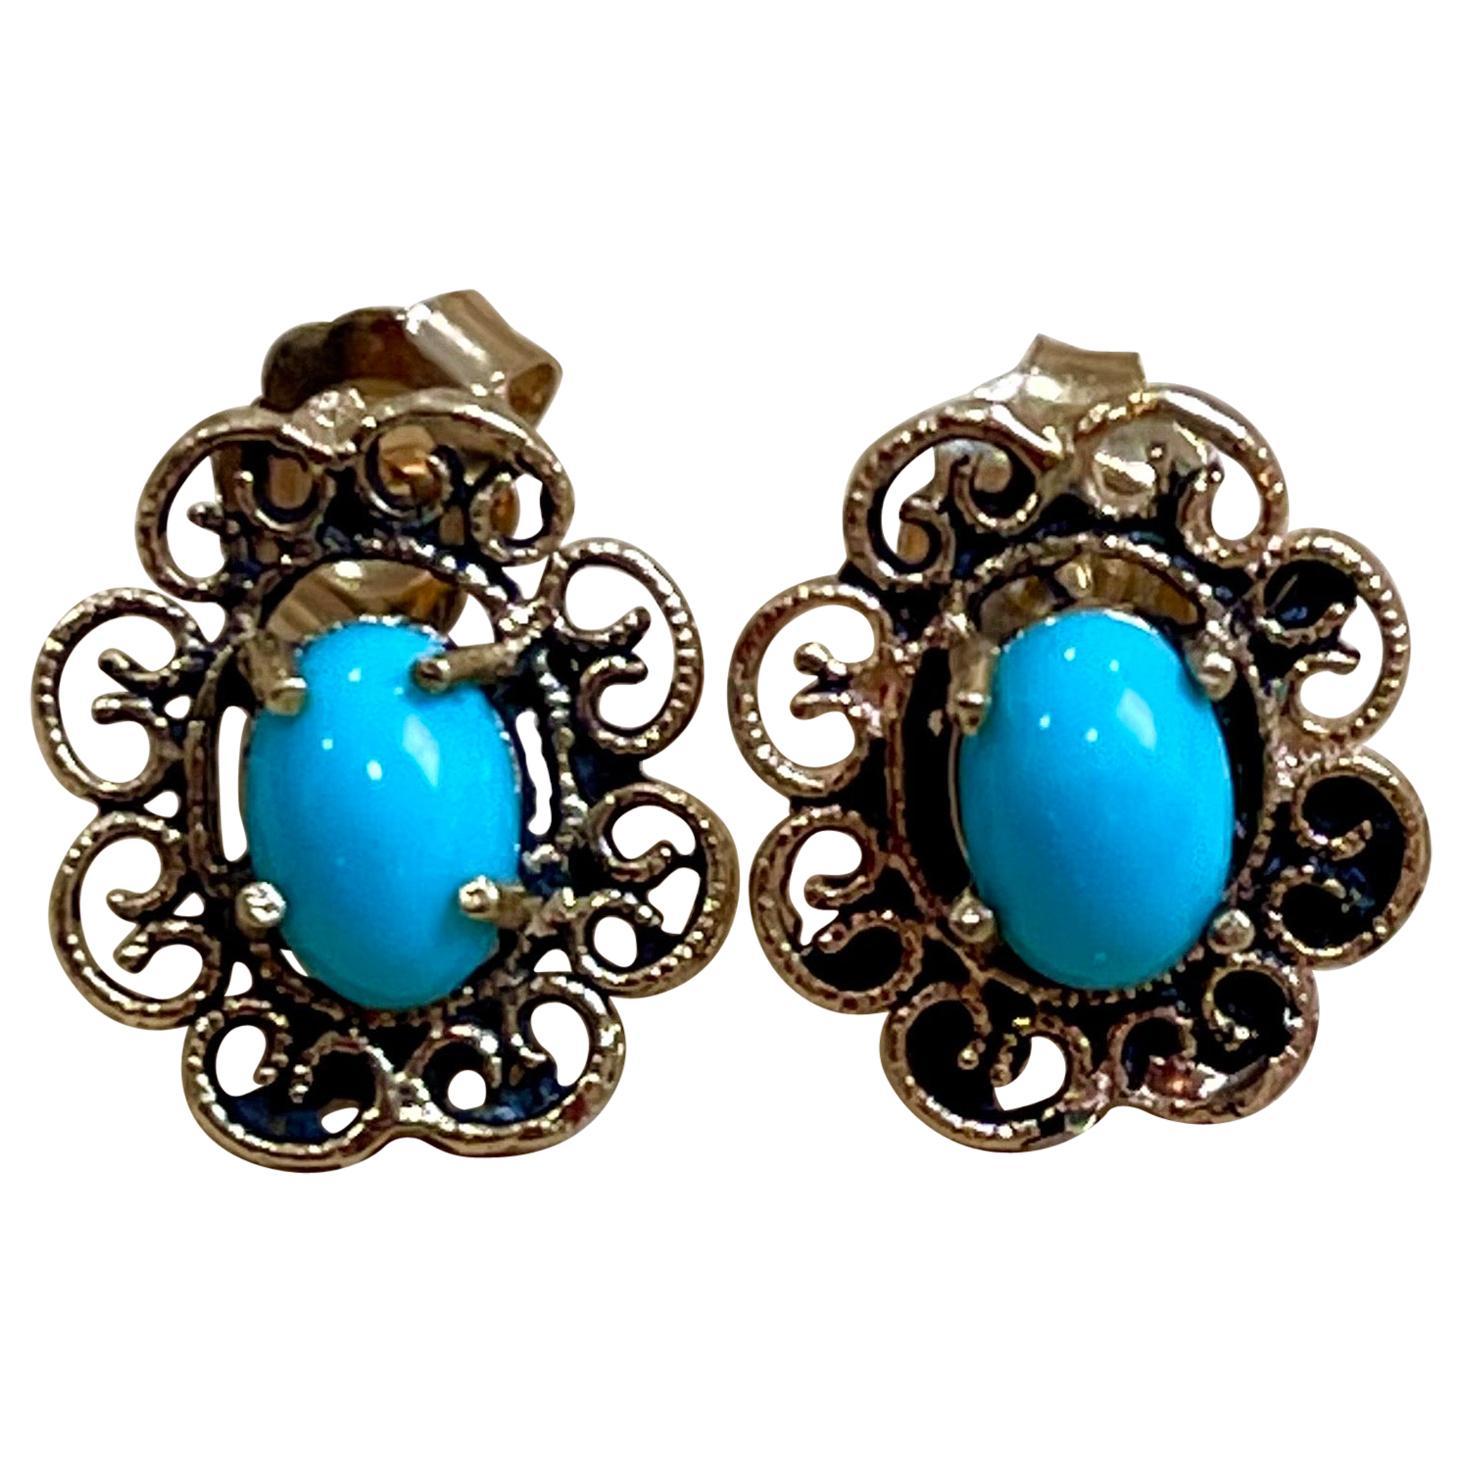 1 Carat Turquoise 14 Karat Yellow Gold Earrings, Stud Post Earring, Vintage